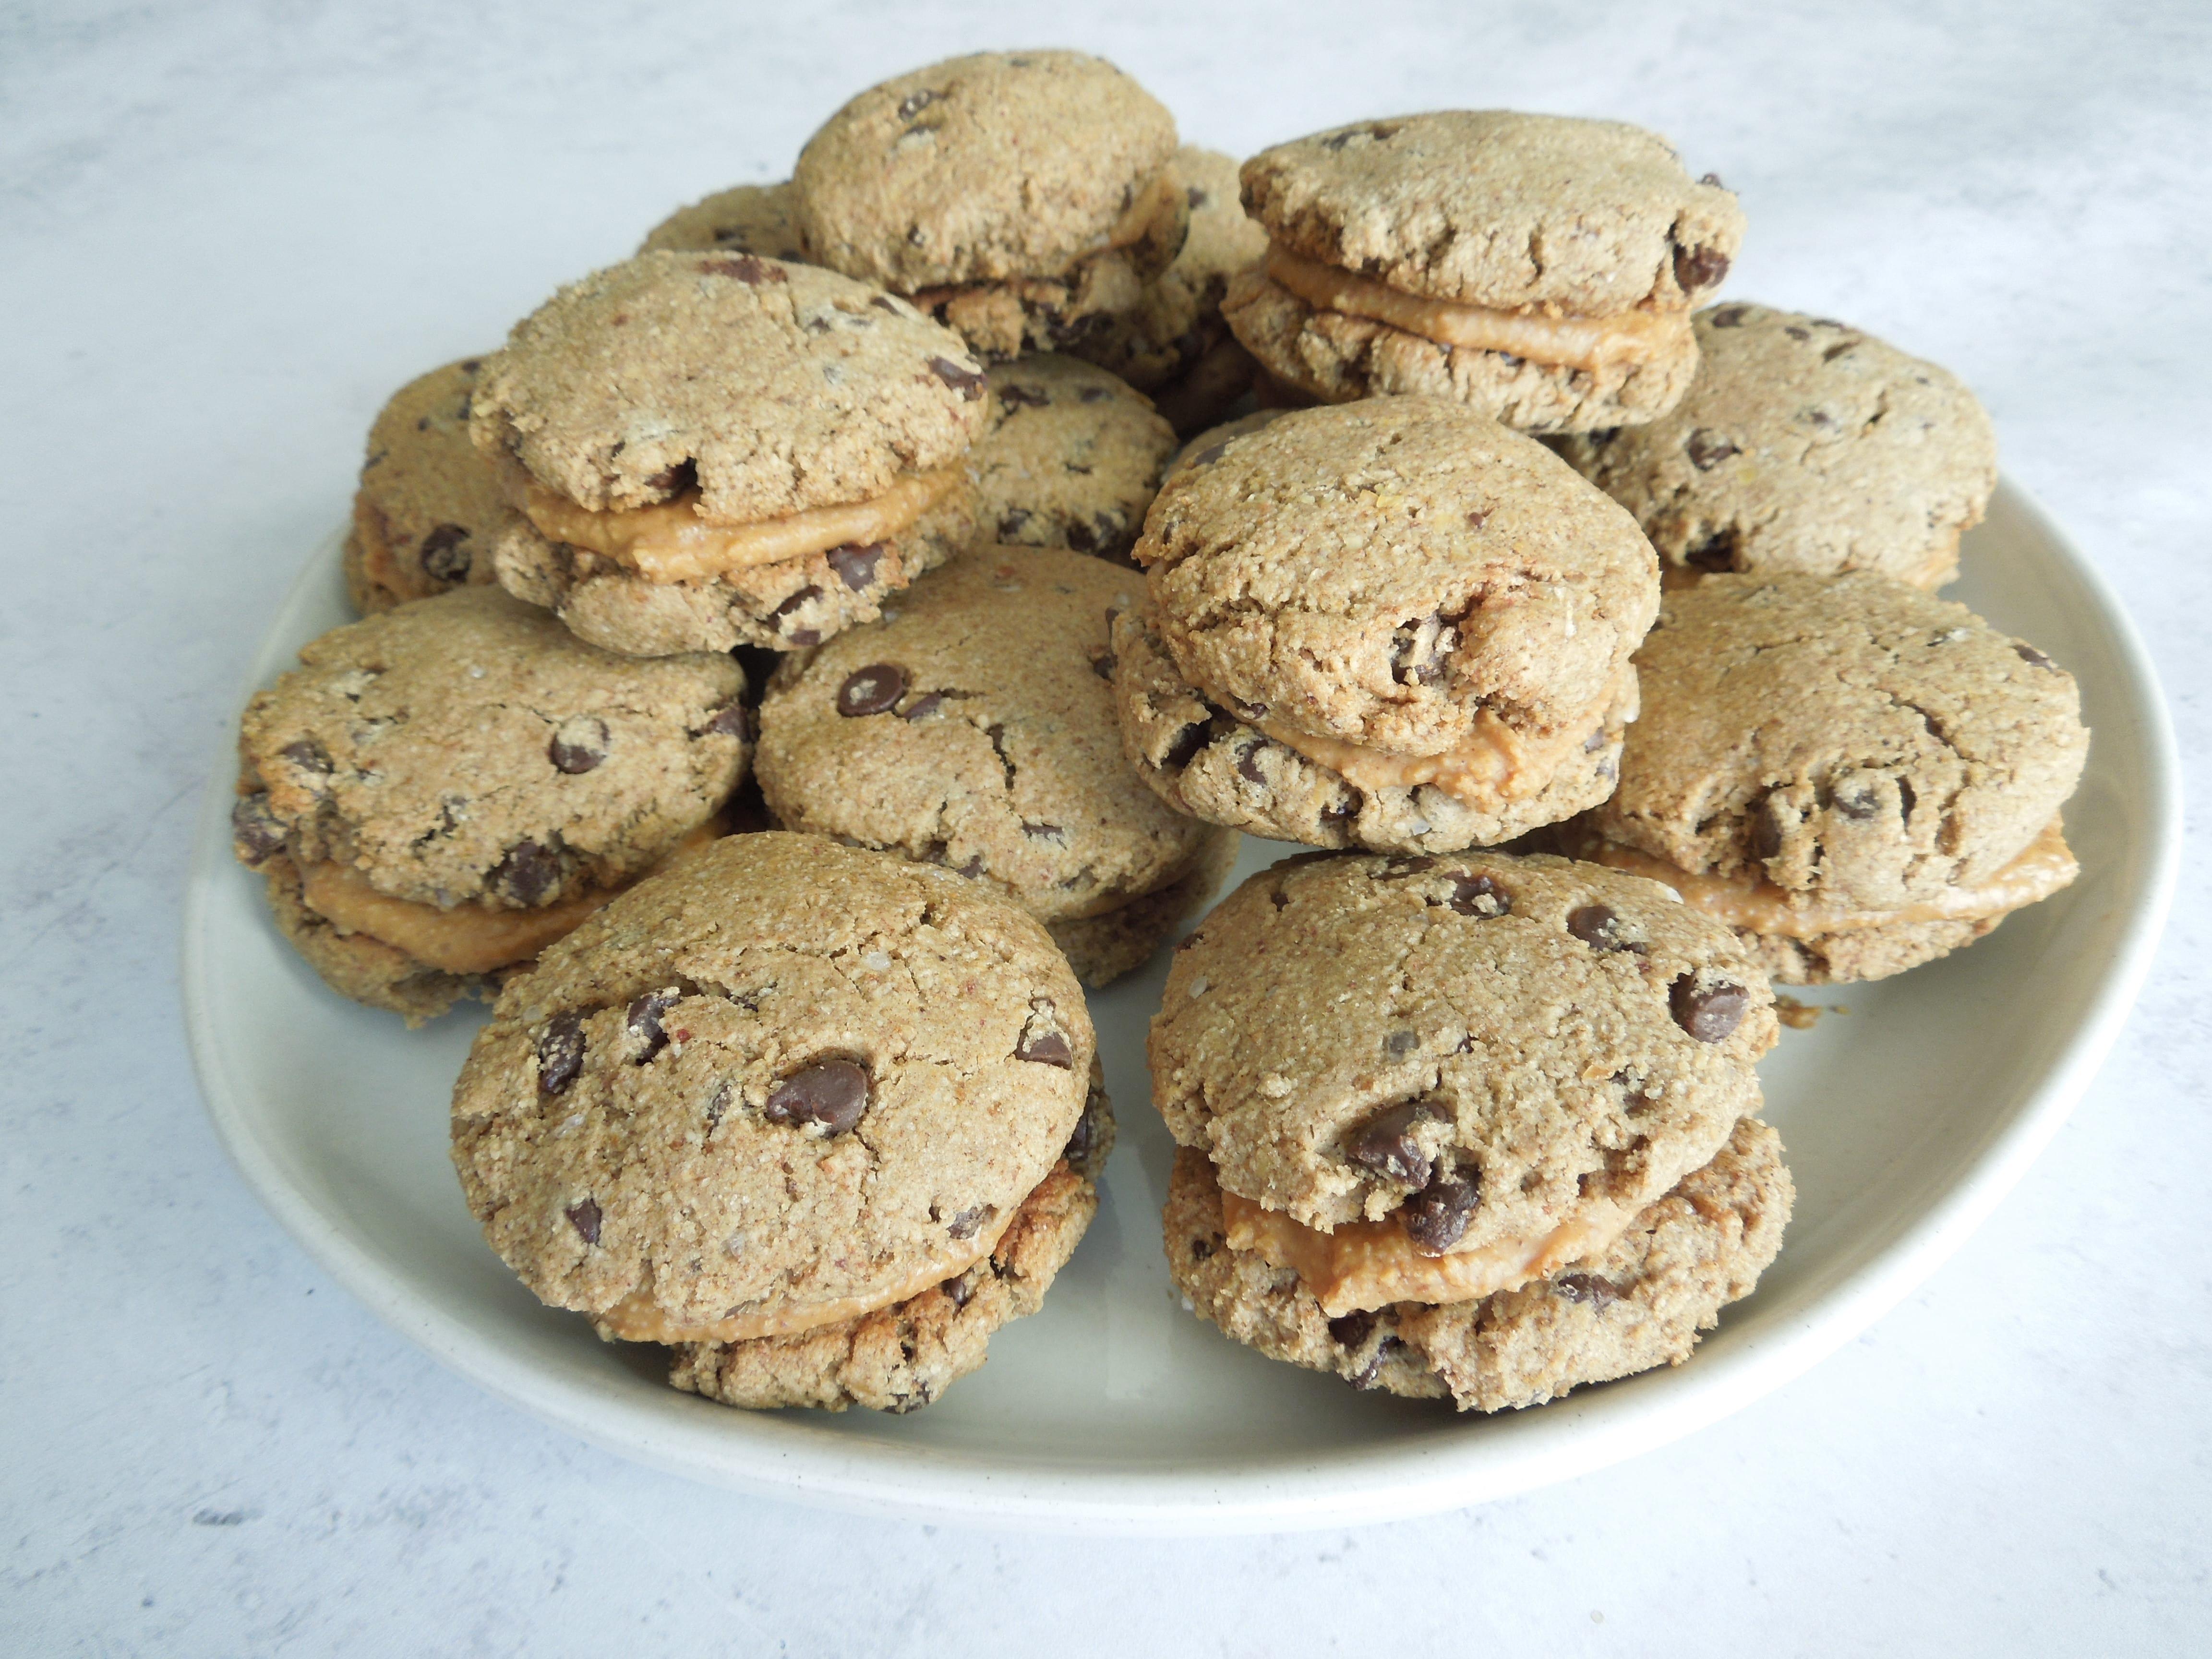 Vegan Chocolate Chip Cookie Peanut Butter Sandwiches